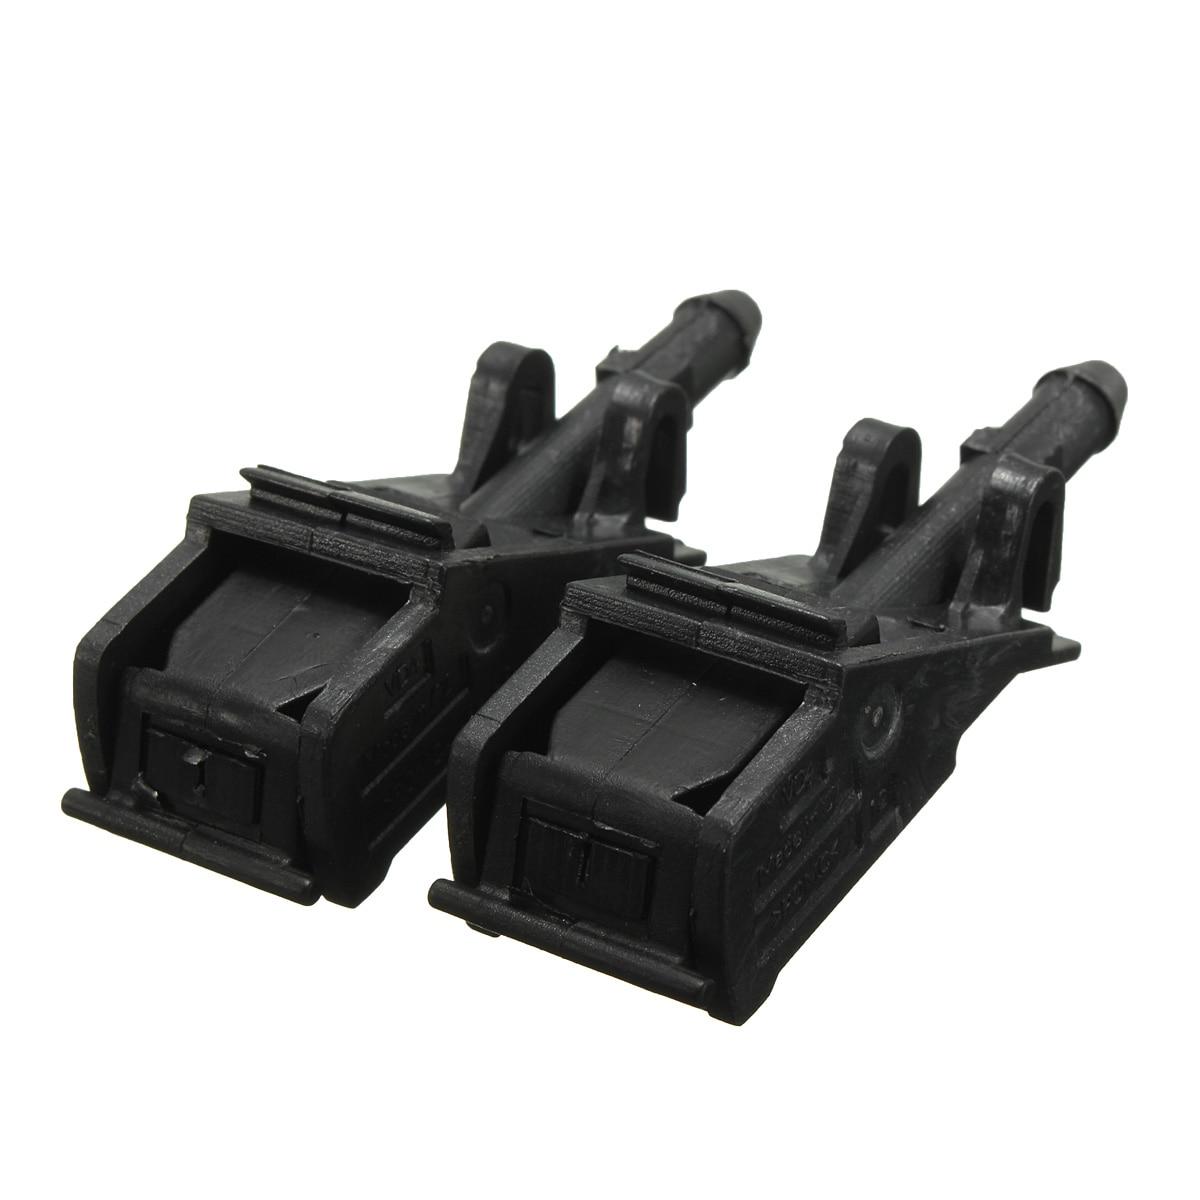 Black Windshield Water Sprayer Jet- Spray Washer Nozzle For VW Beetle For Jetta Golf GTI Passat Touareg Rabbit 6E0955985B